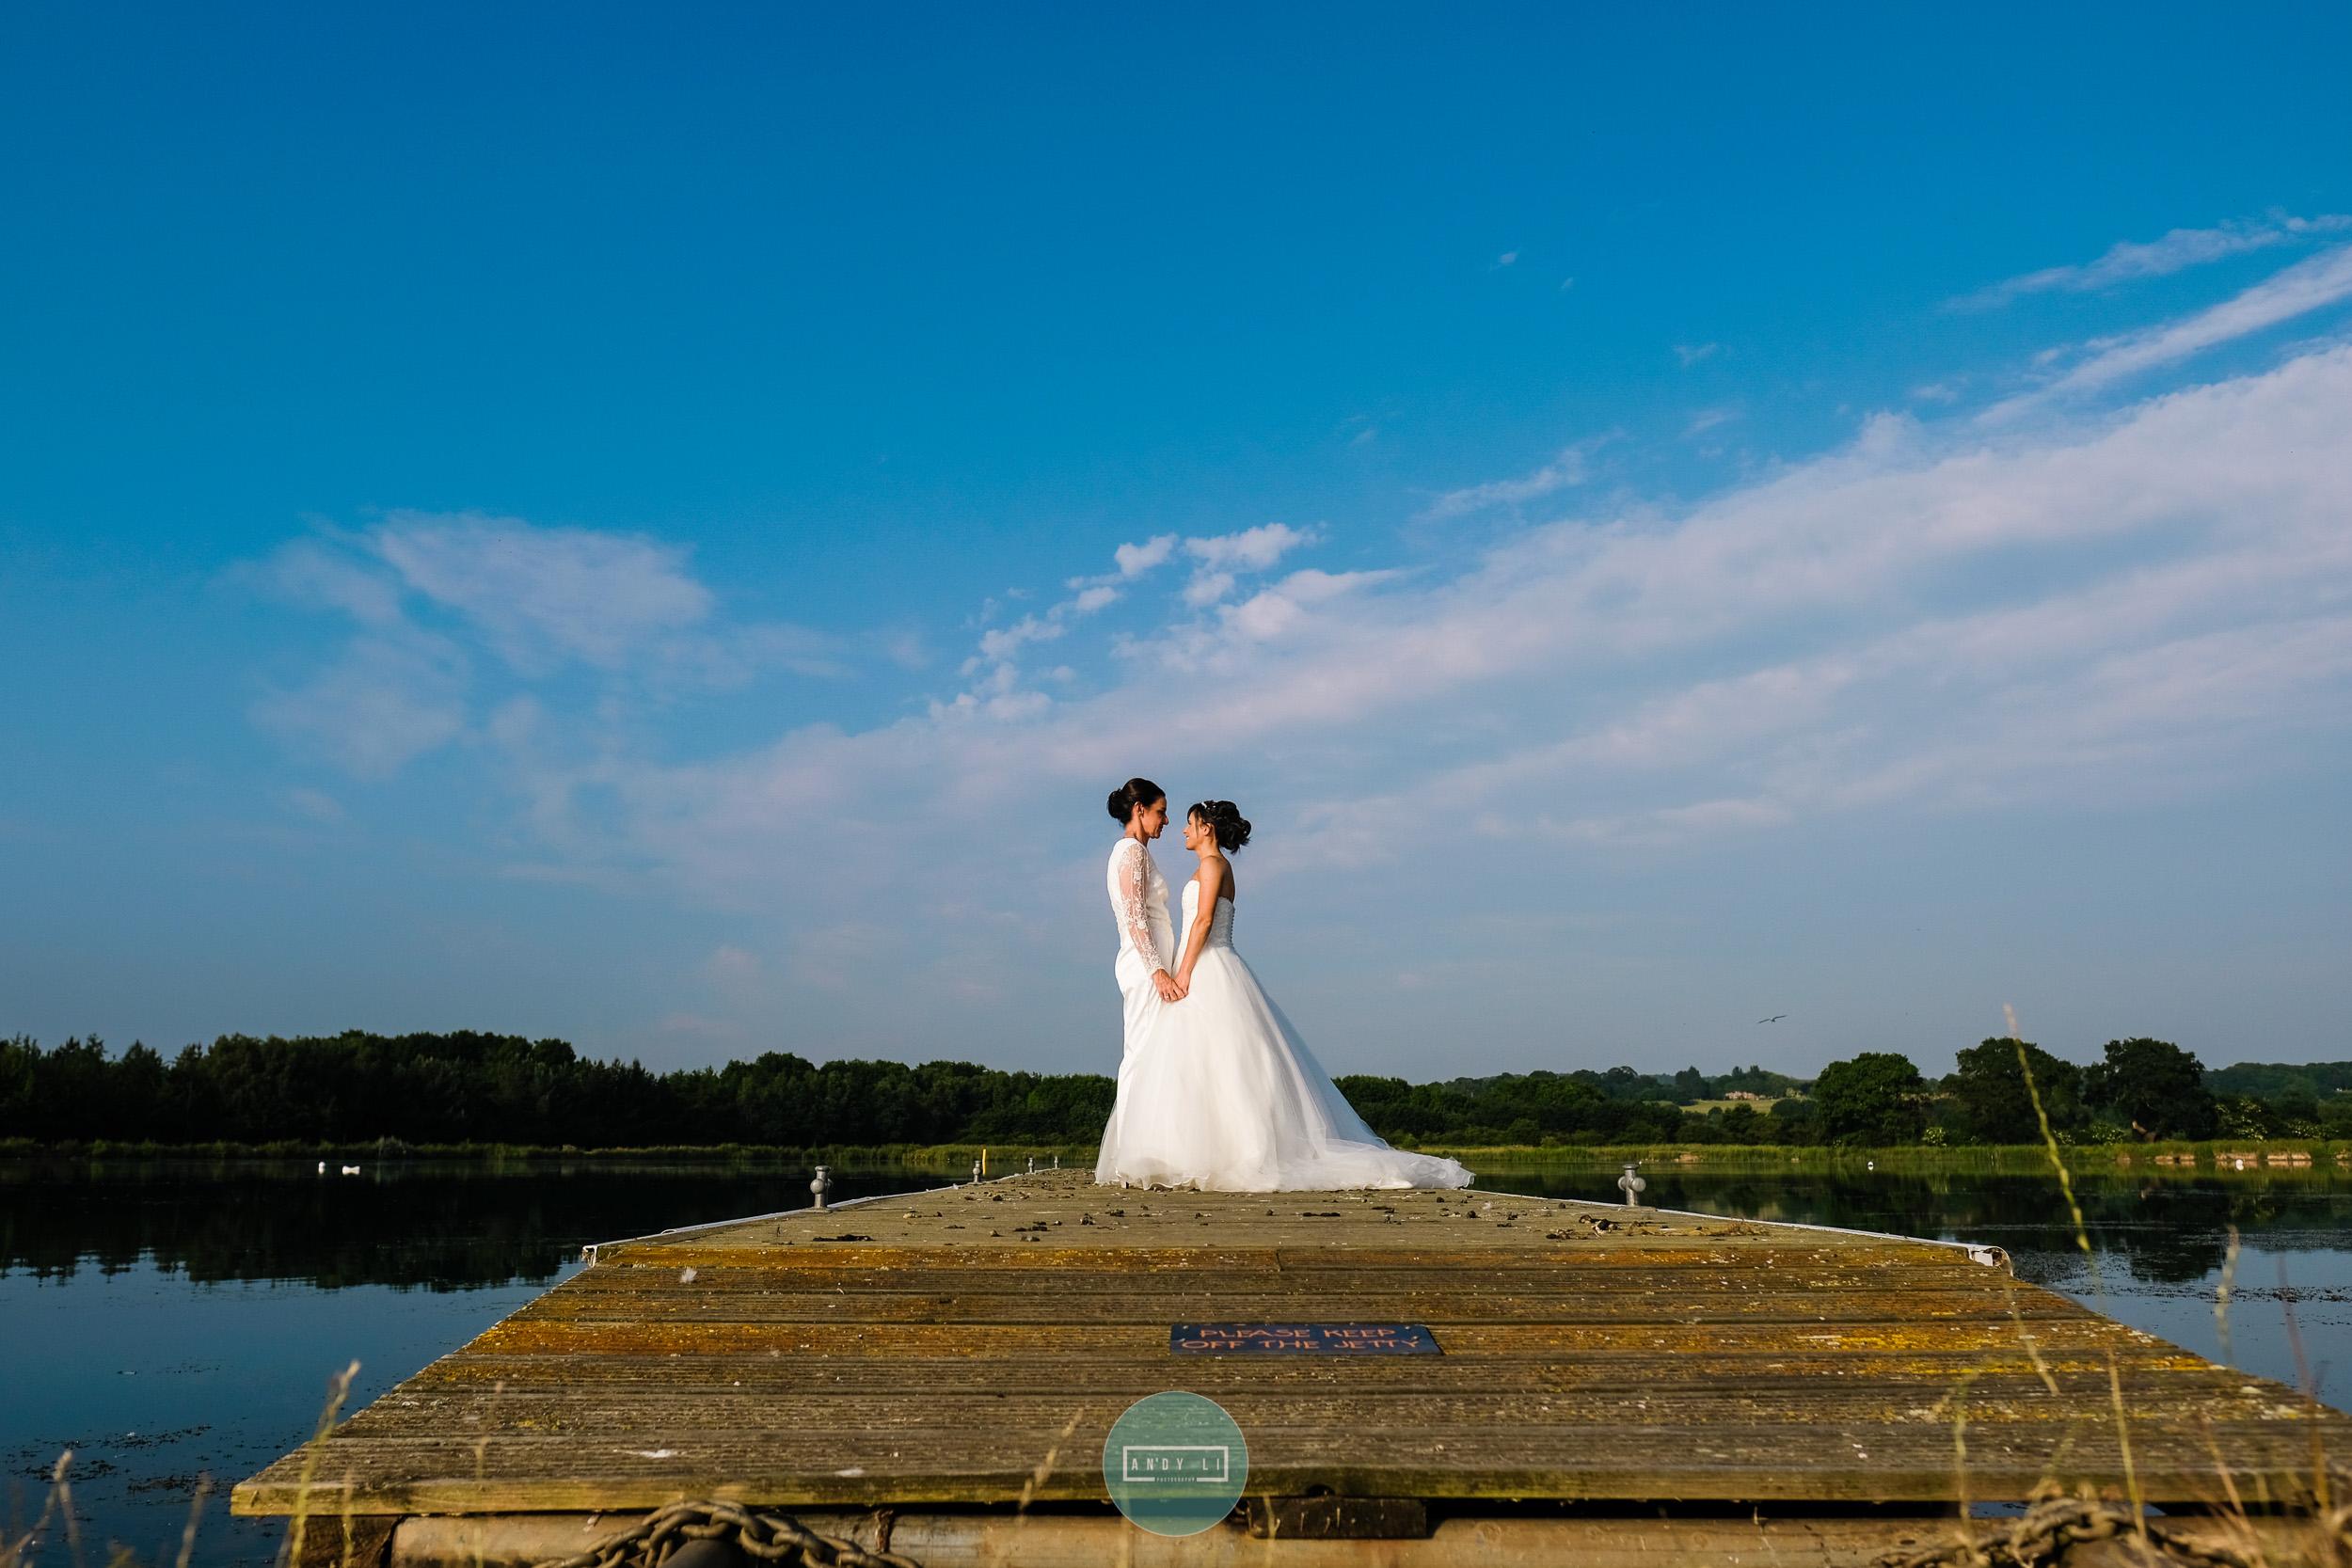 Manley Mere Cheshire Wedding Photographer-010-XPRO0350.jpg